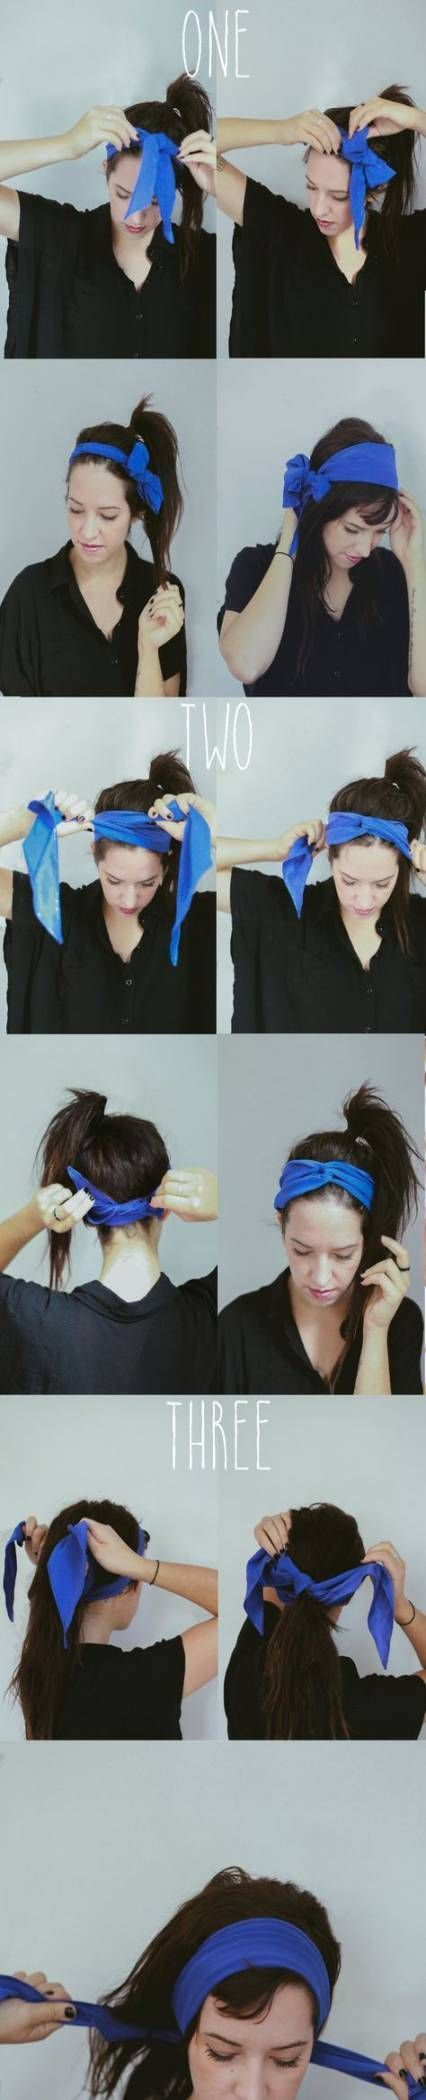 61+ ideas how to wear a bandana in your hair tutorial headscarves